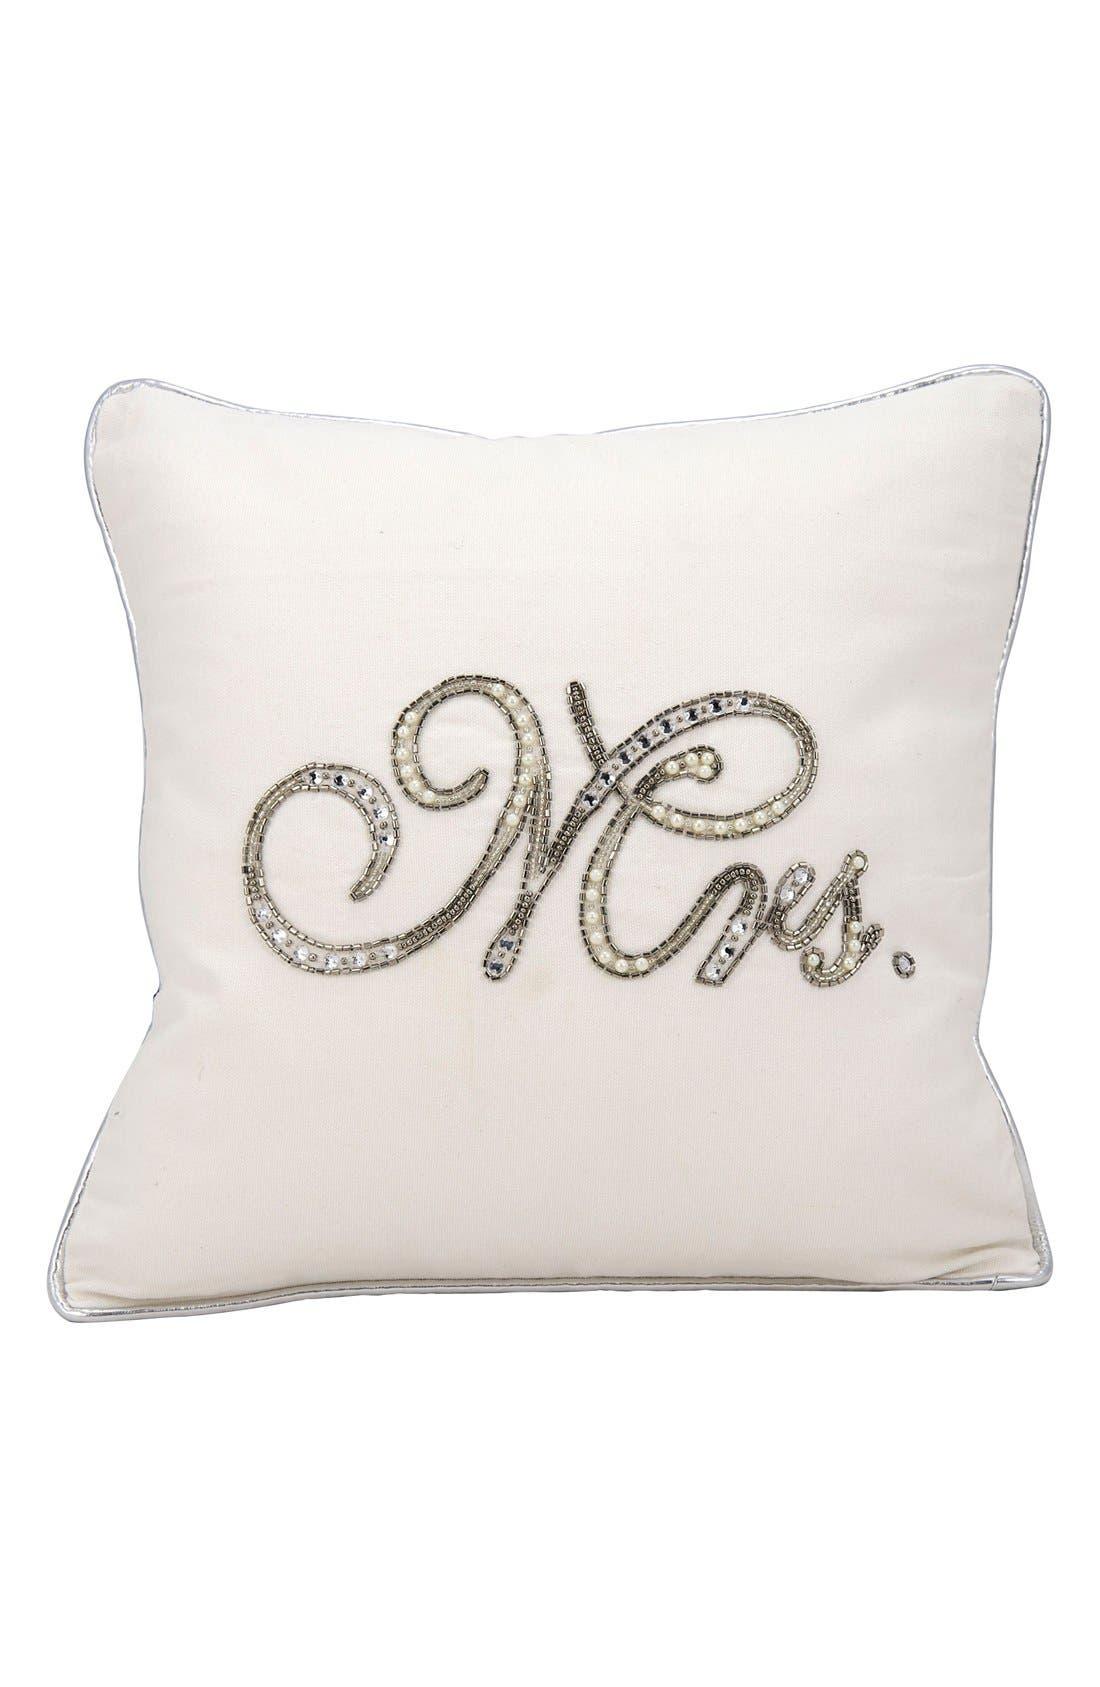 Embellished Wedding Pillow,                         Main,                         color, Mrs